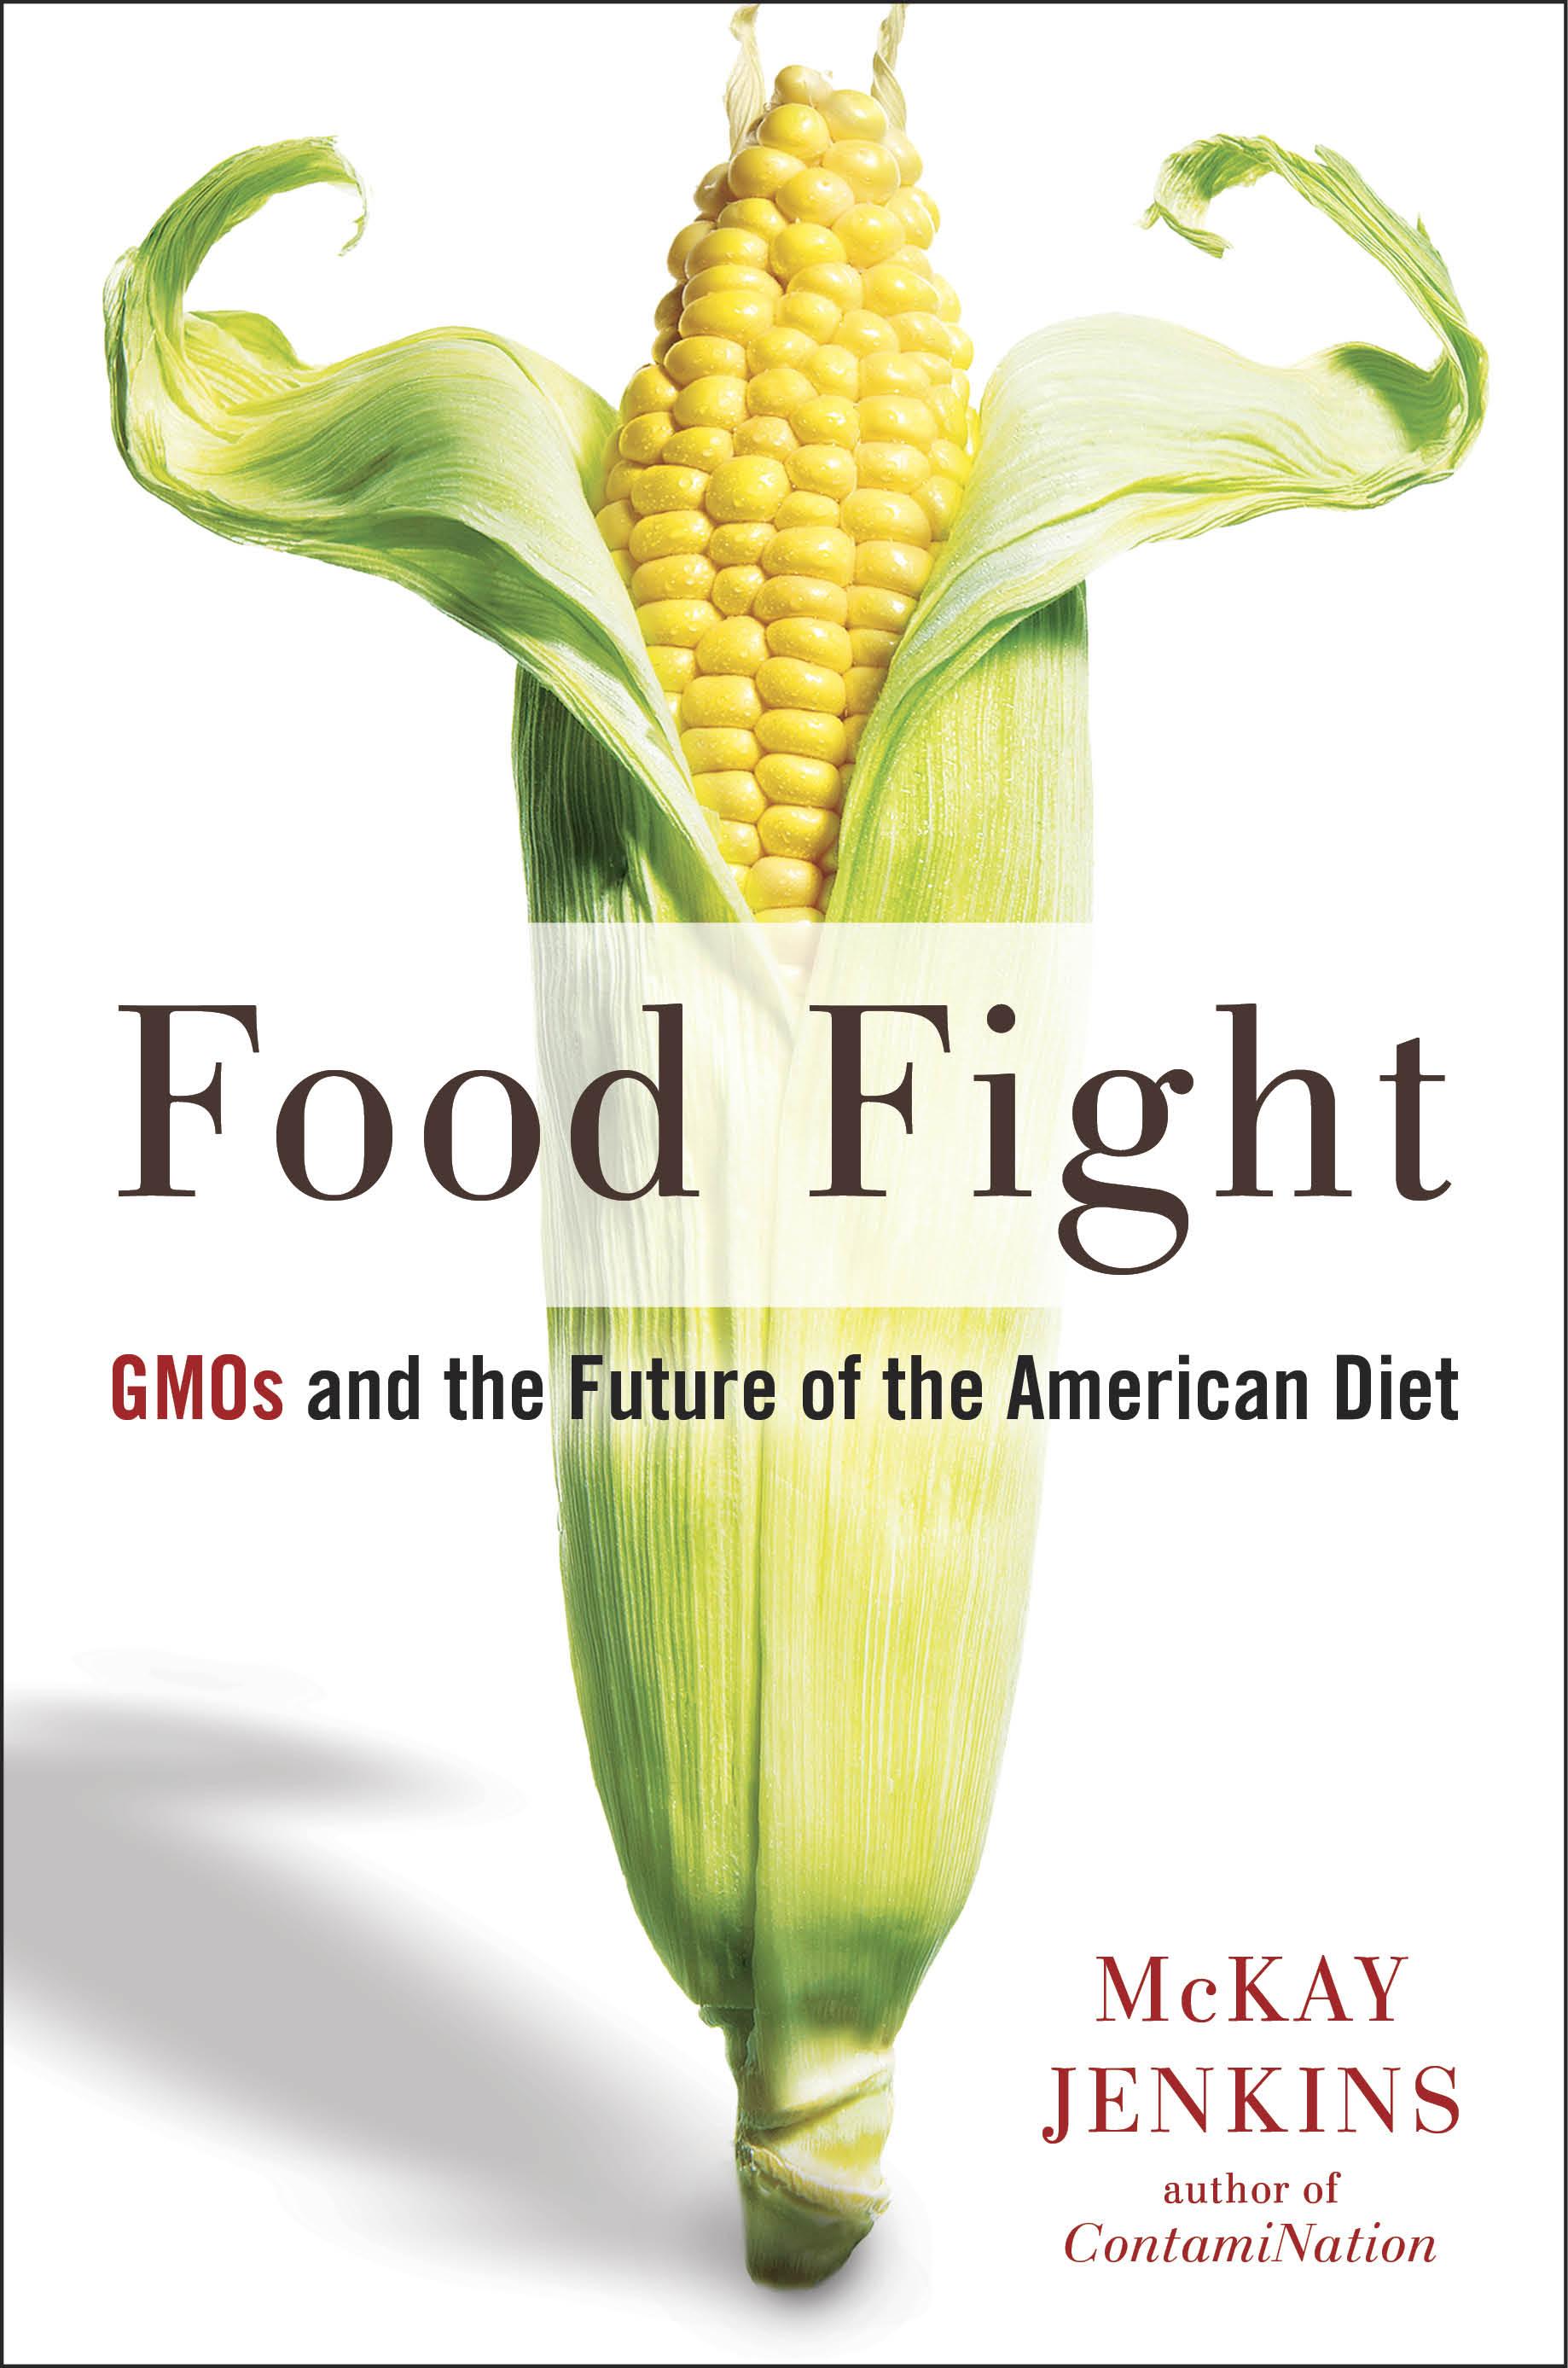 Food Fight, by McKay Jenkins